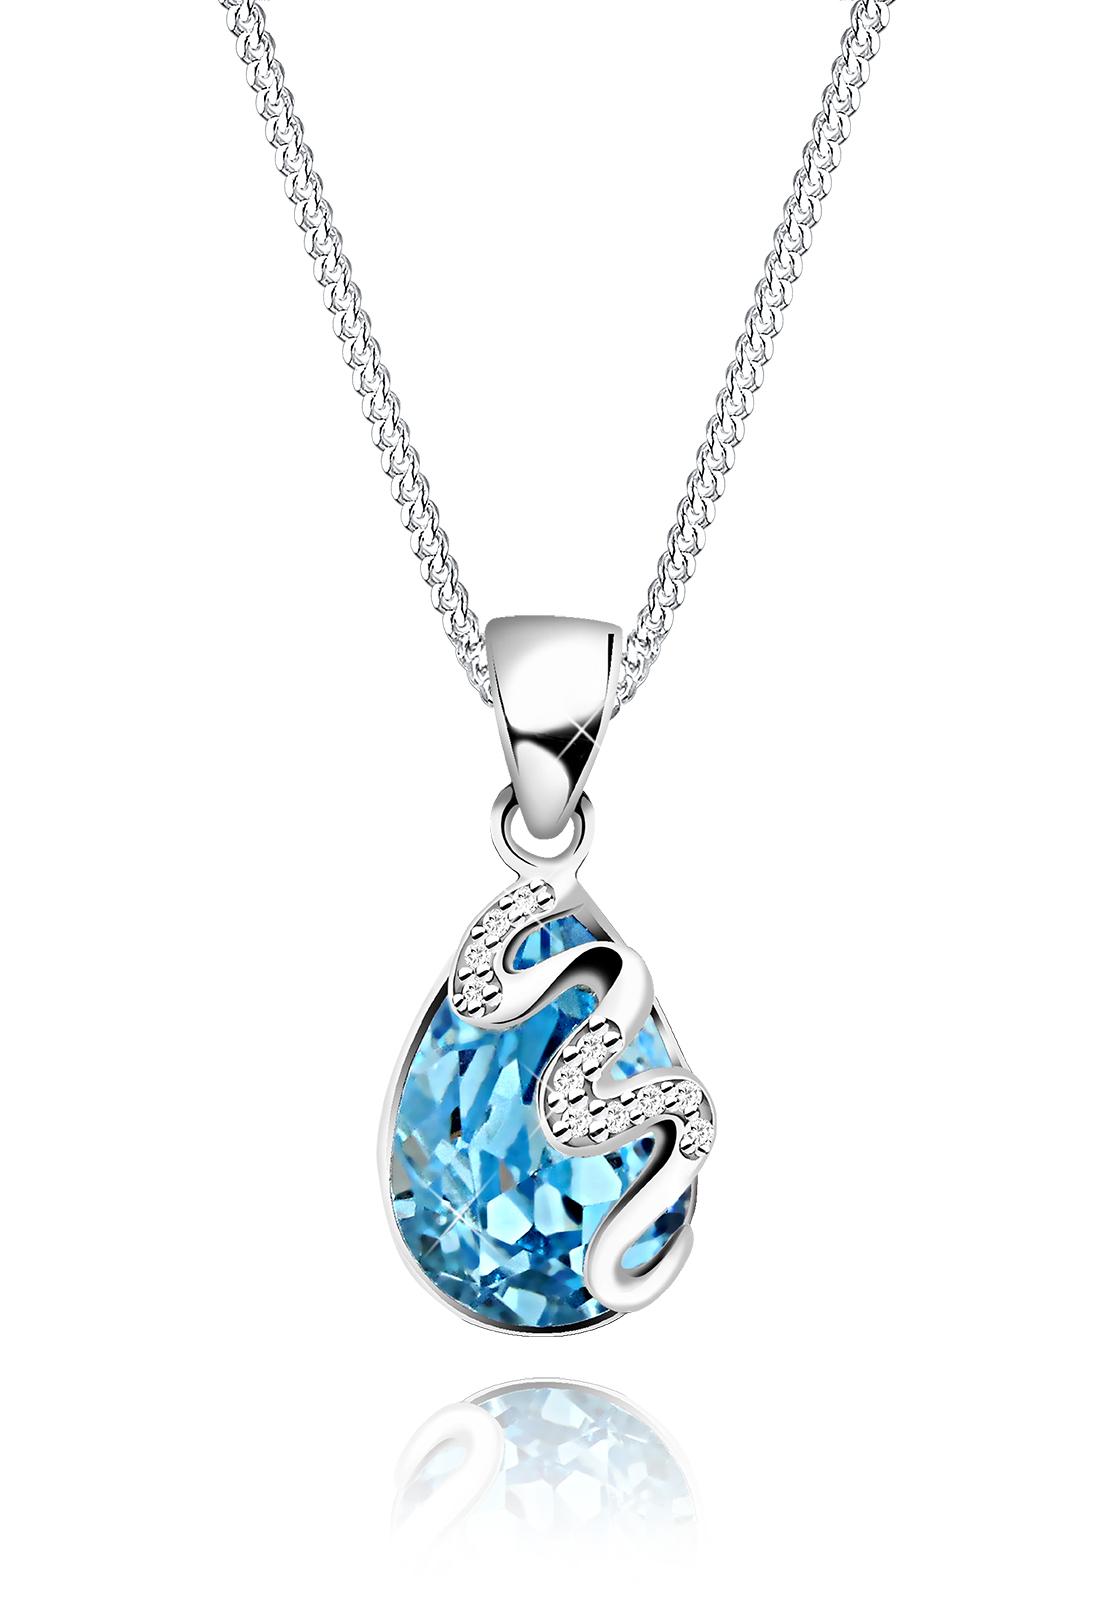 Halskette Tropfen   Kristall ( Hellblau )   925er Sterling Silber